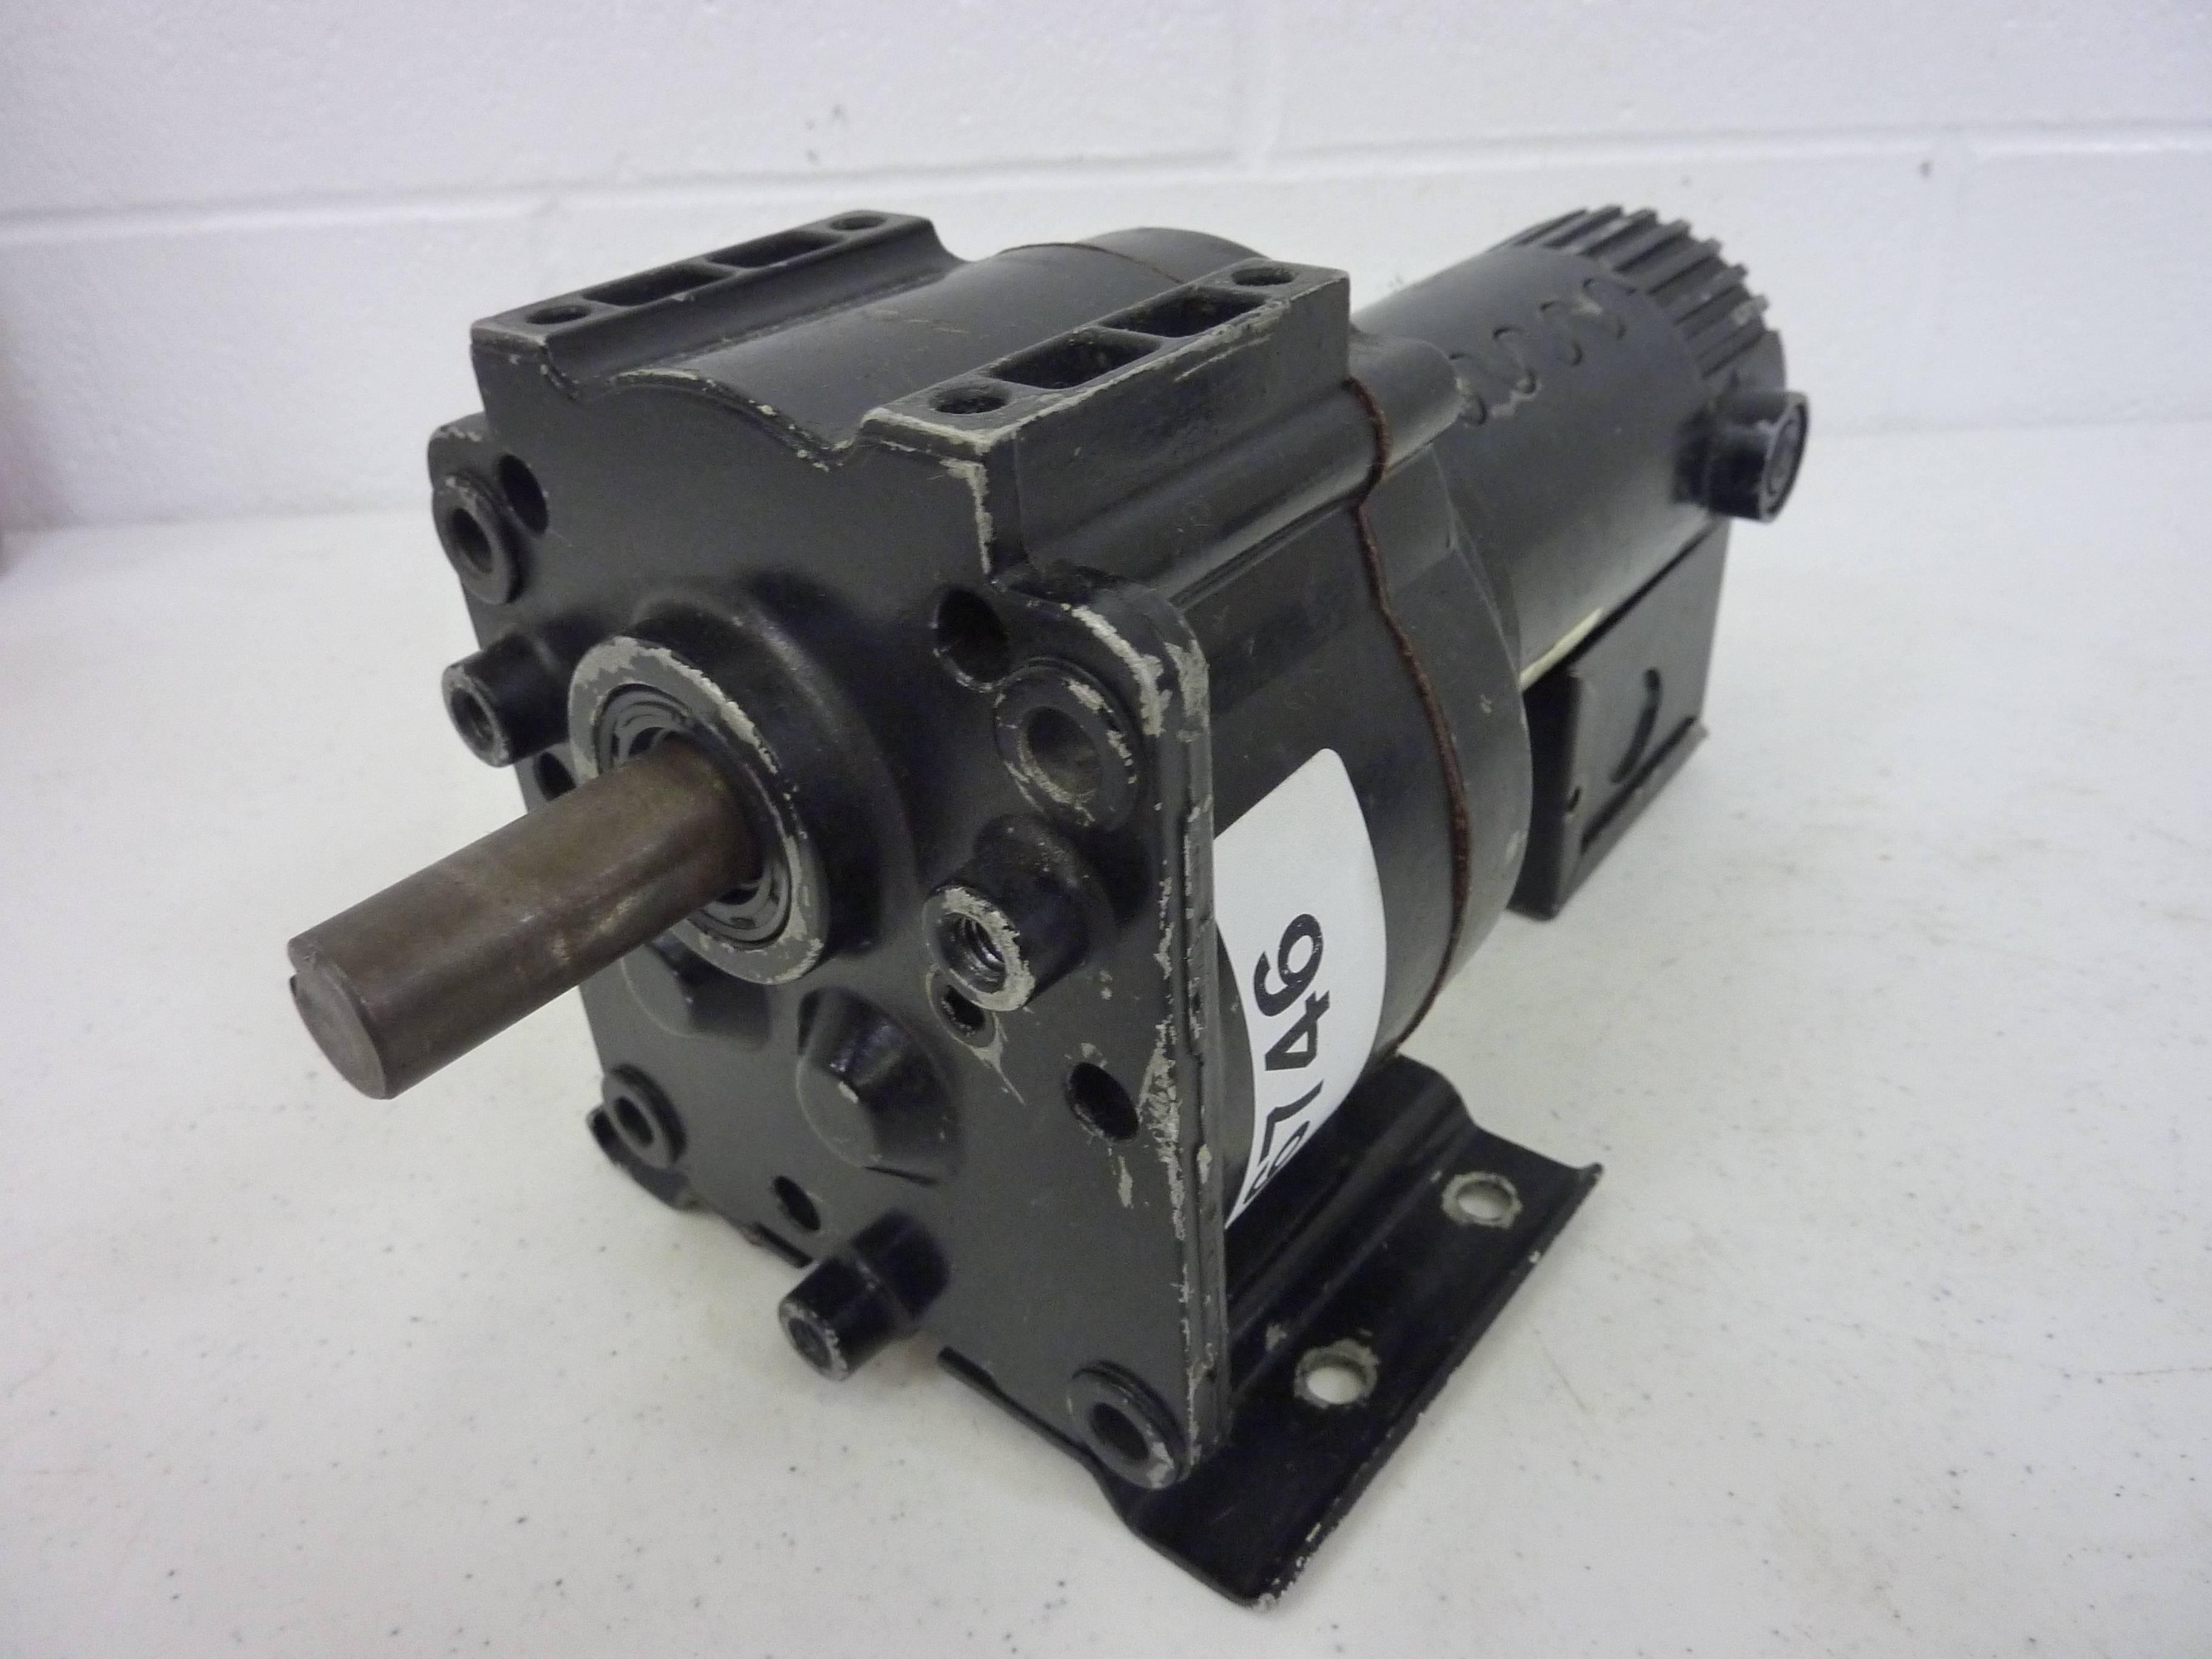 Dayton gear motor 4z132b used 56746 ebay for Perm 132 motor for sale